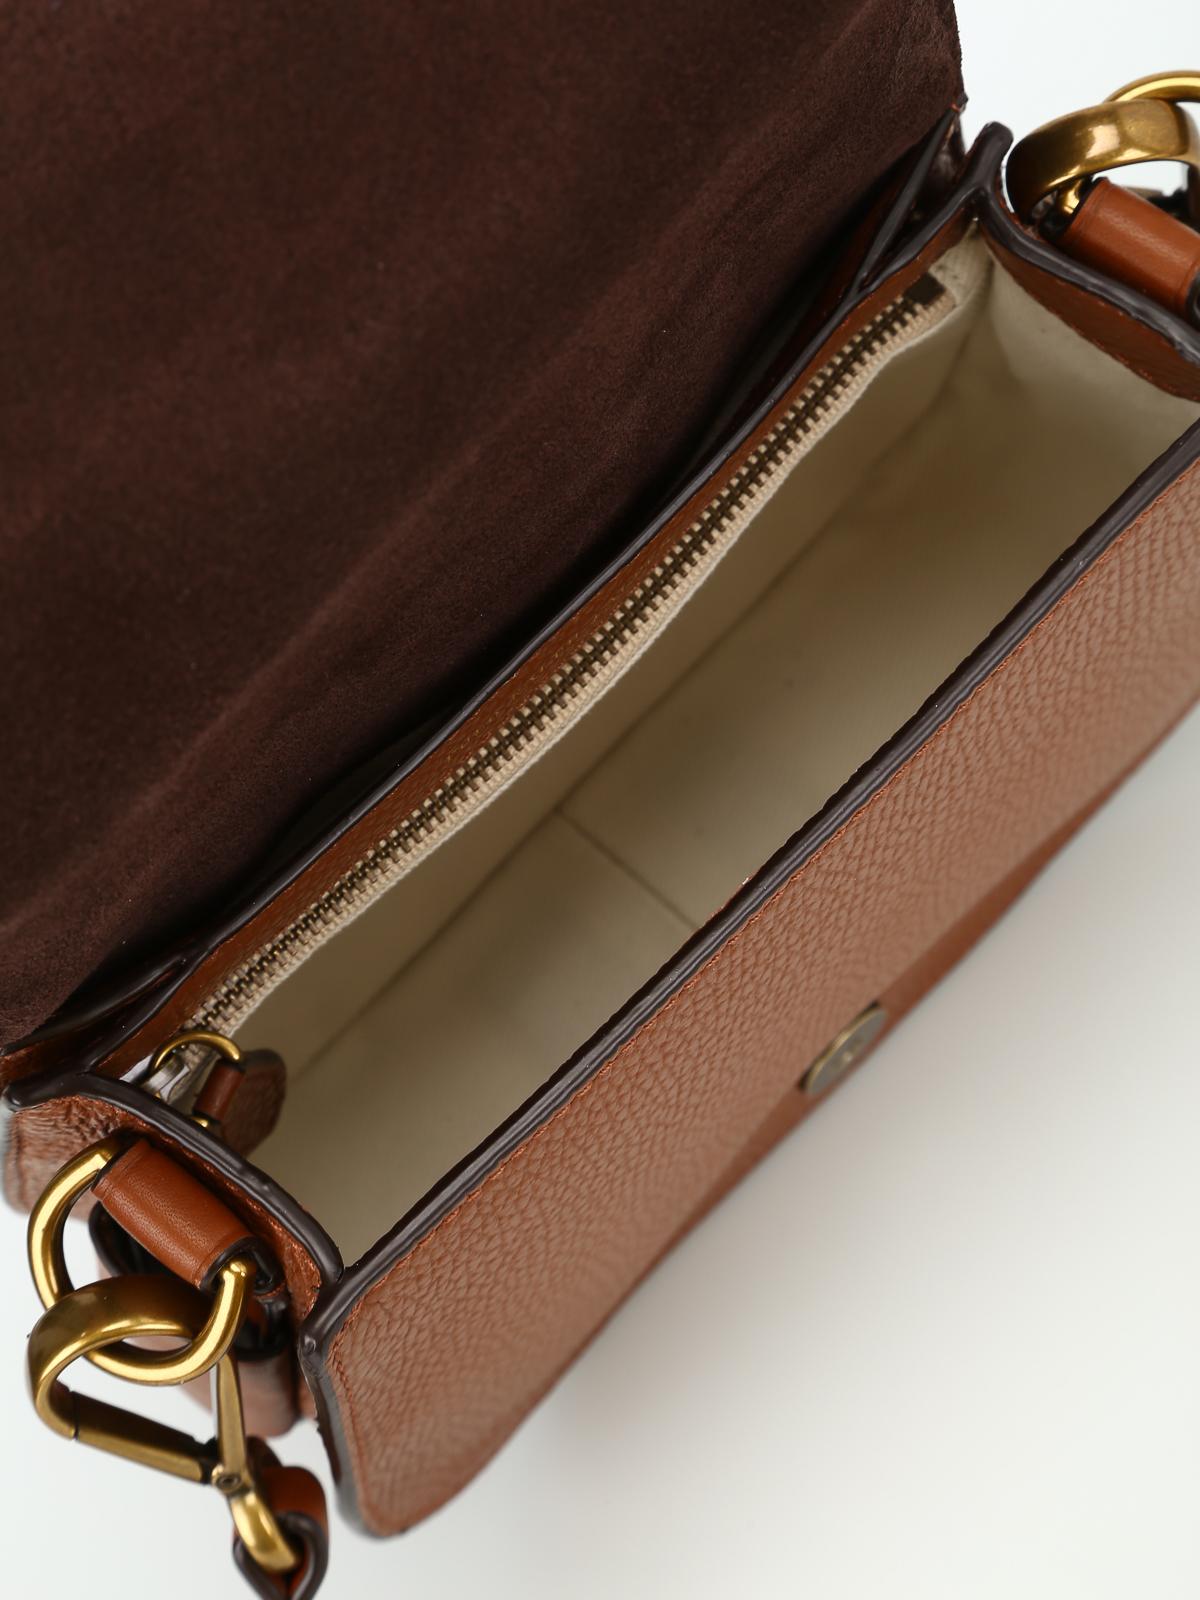 da2b9e7898bc POLO RALPH LAUREN buy online Hammered leather saddle bag · POLO RALPH LAUREN   cross body bags ...